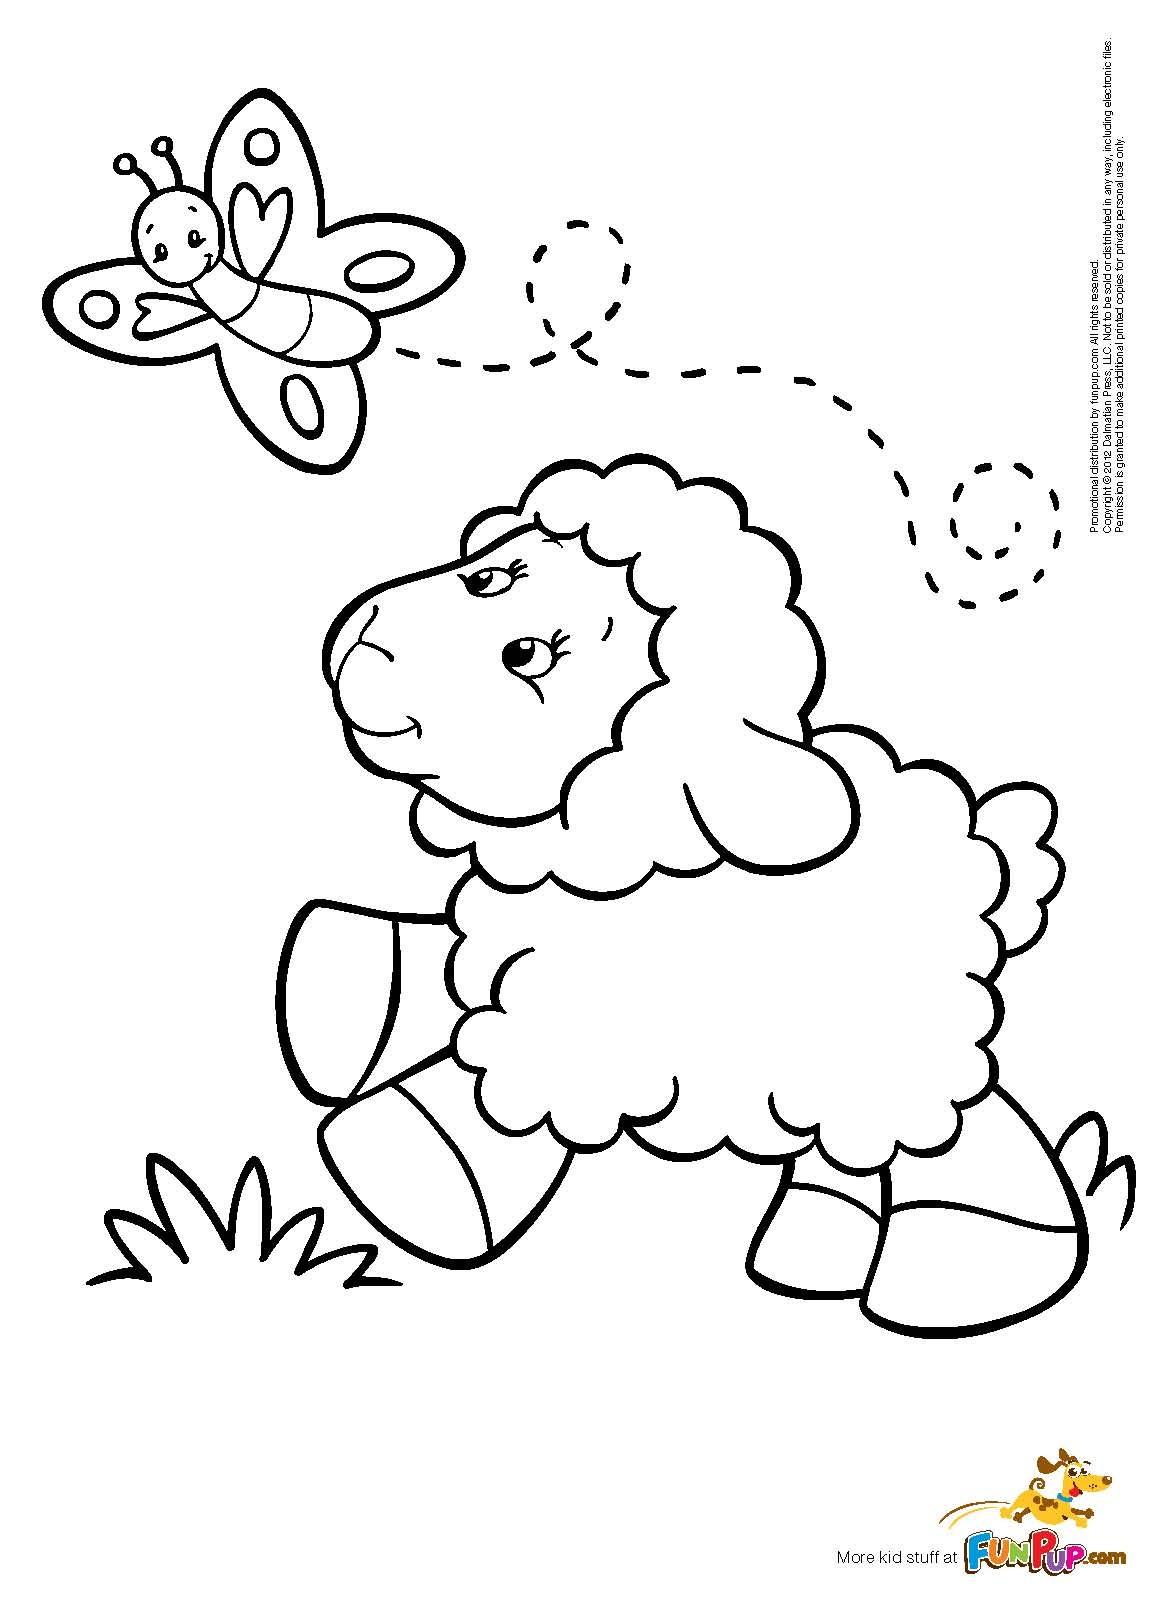 Lamb Of God Coloring Page At Getcolorings